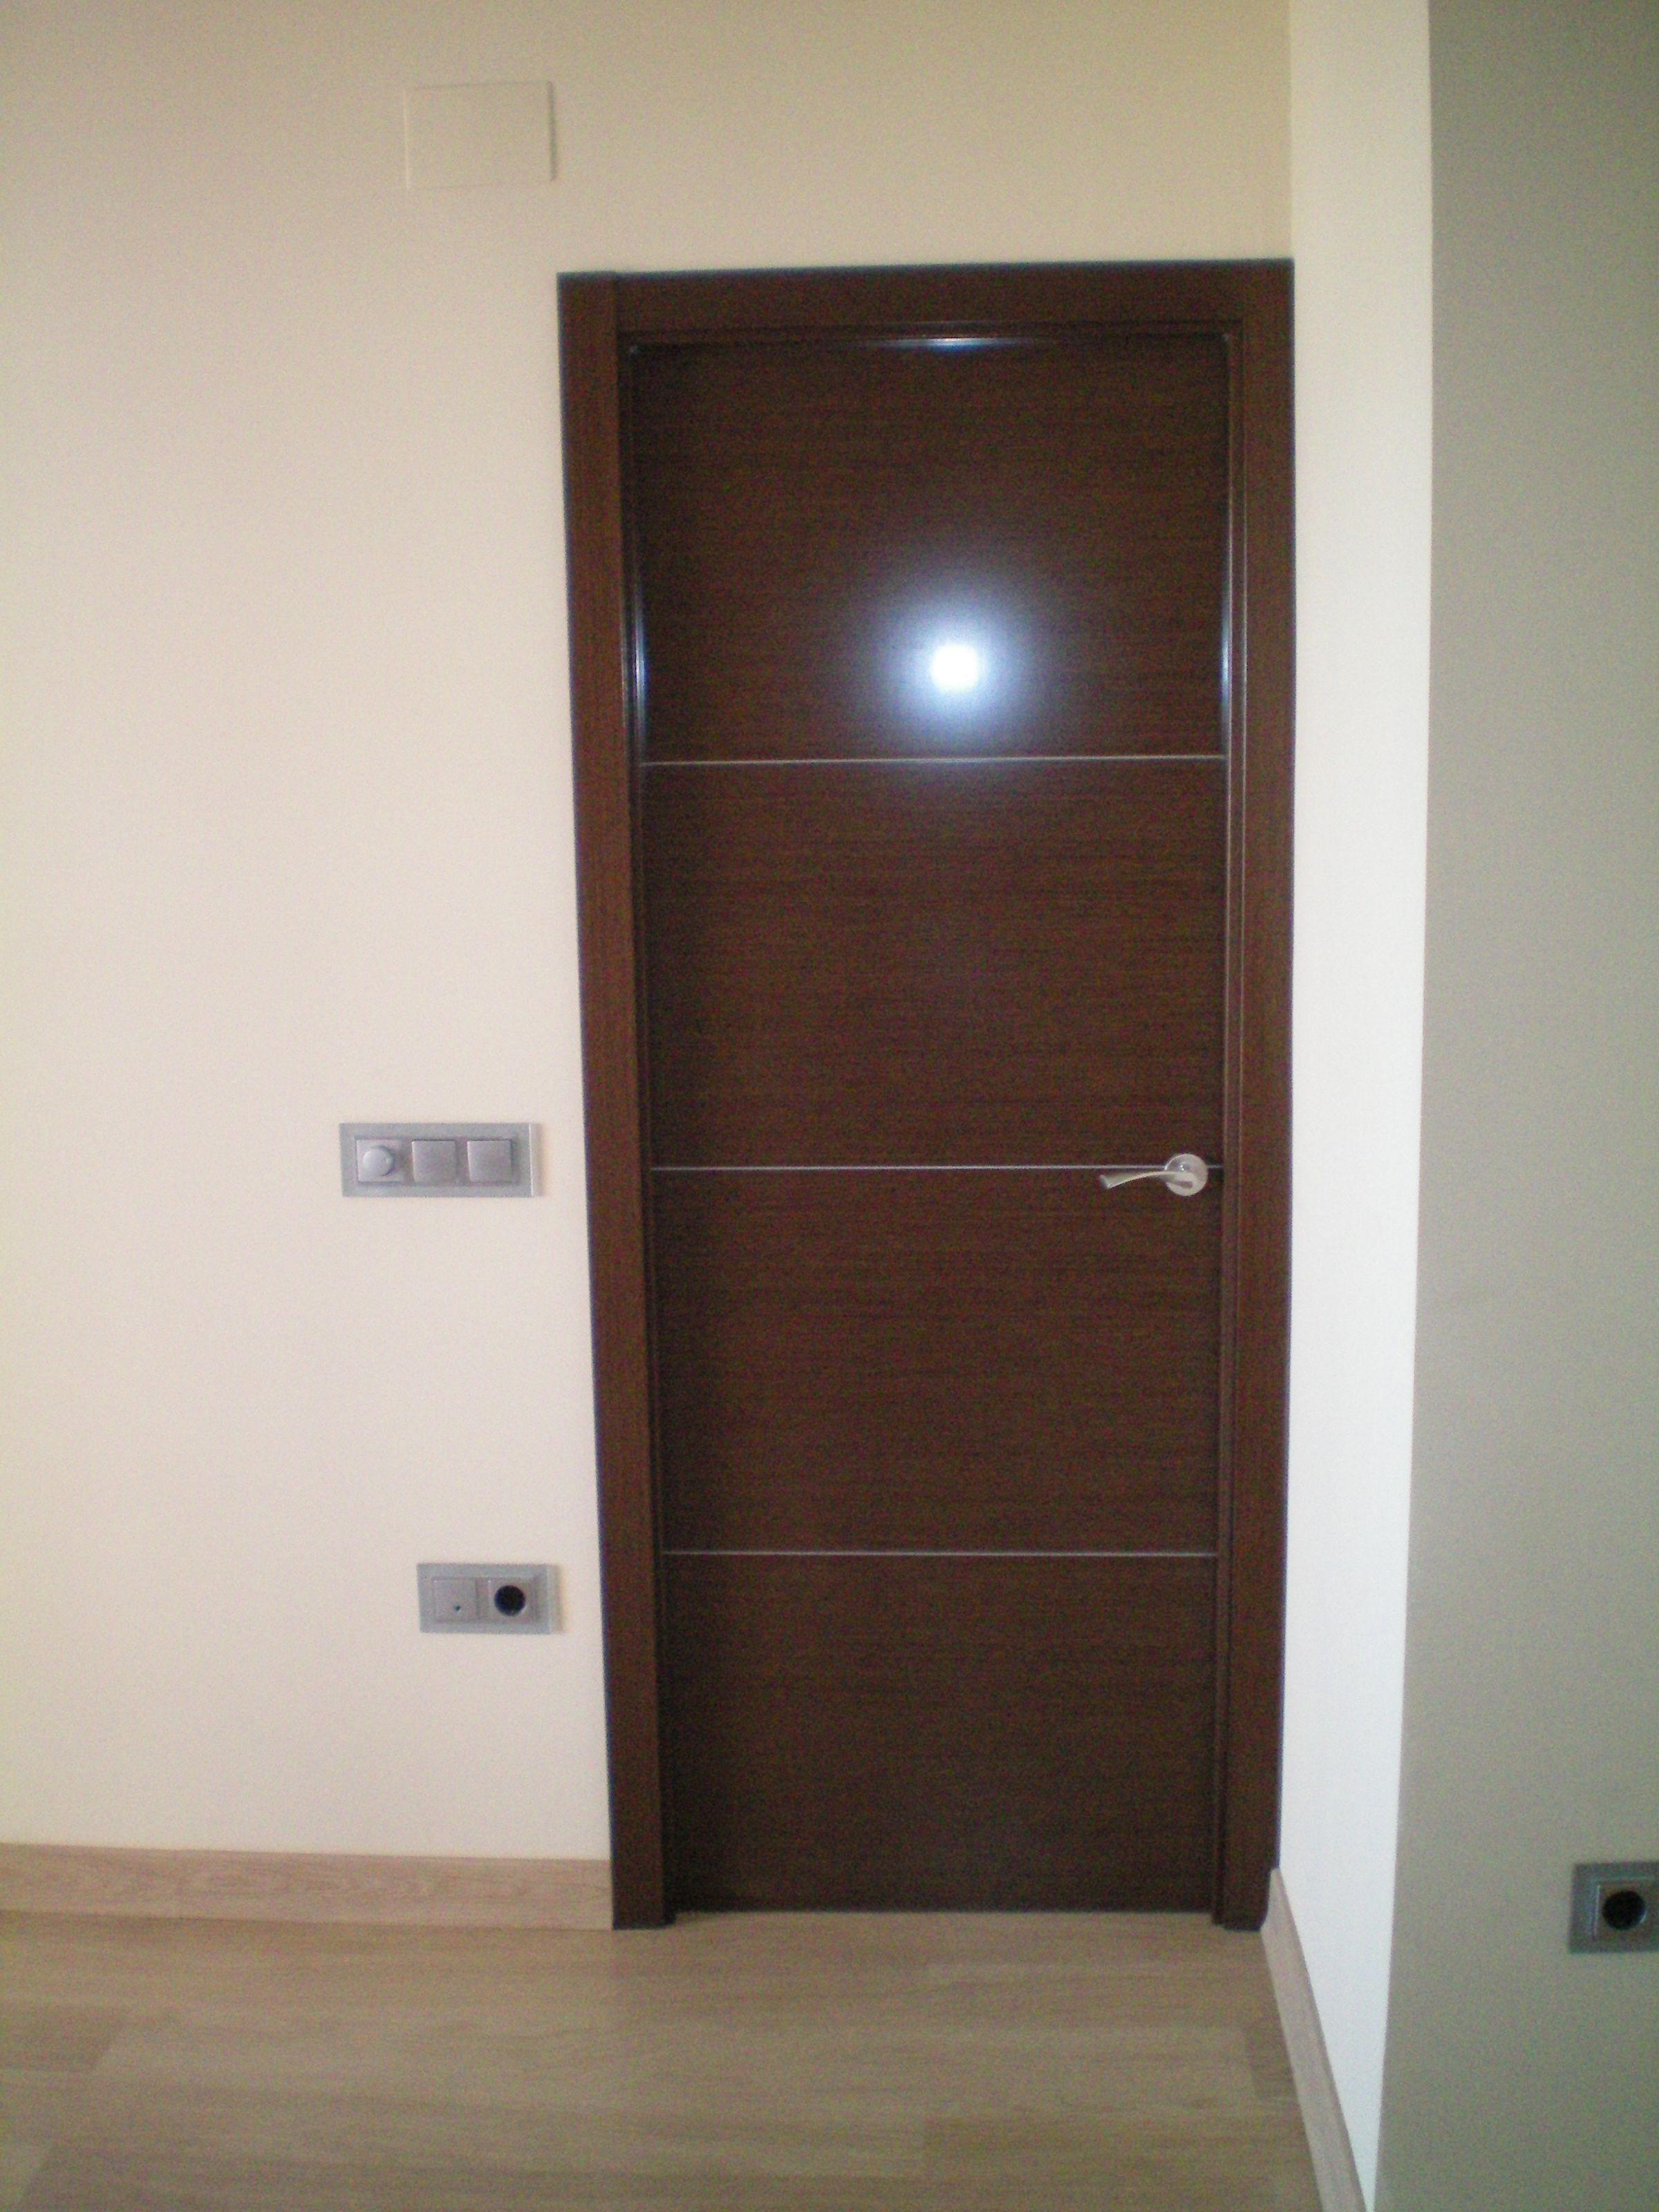 Cm12 wengu detalle greca en pvc puertas madera natural for Porte 10 rajeb